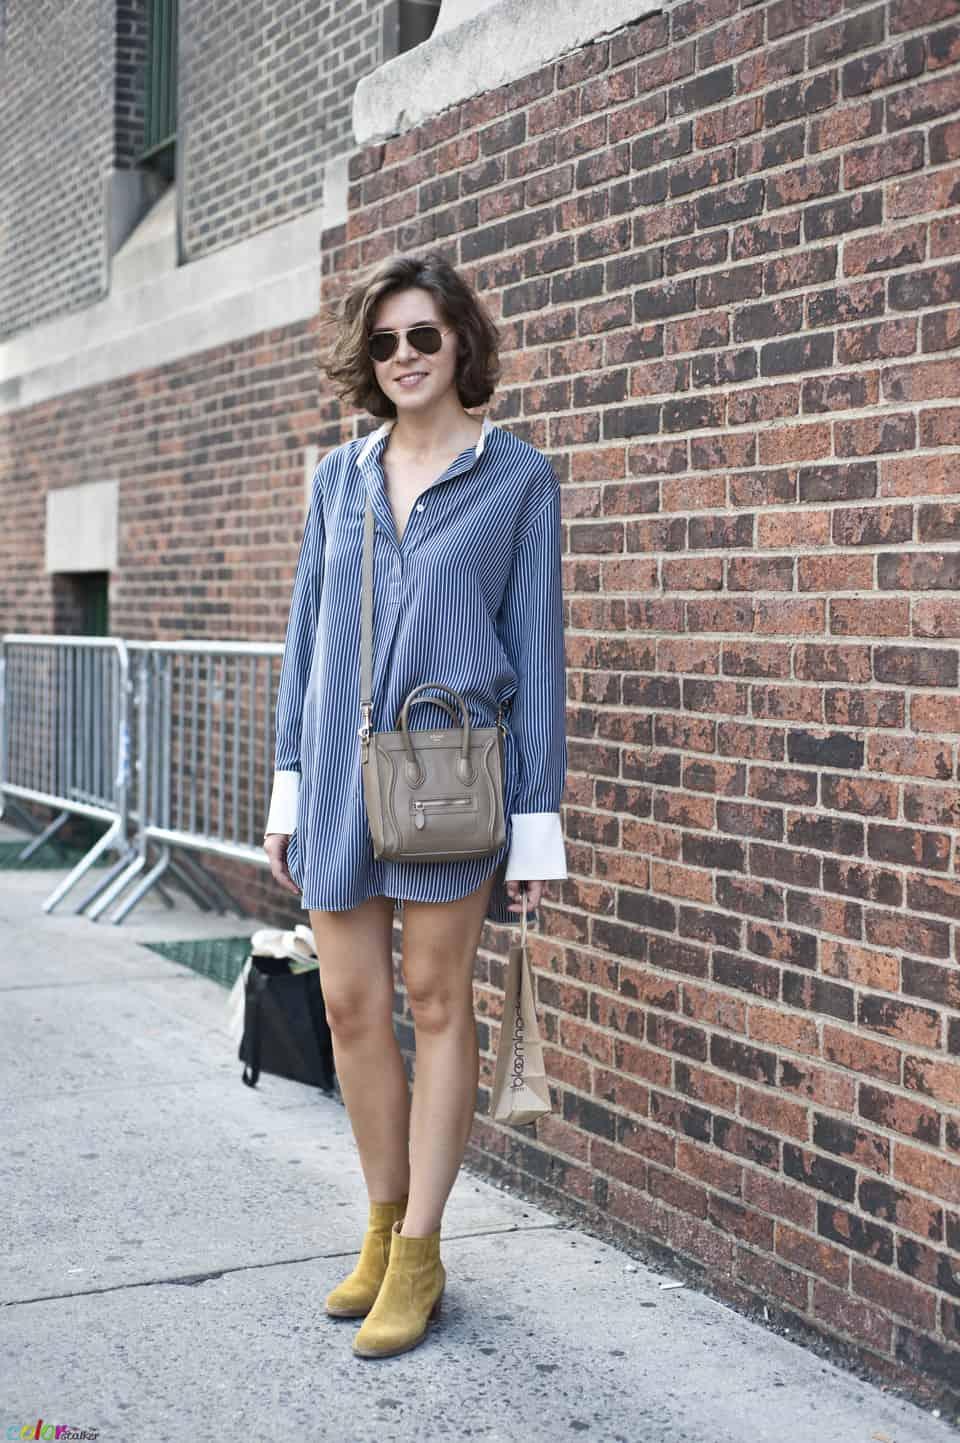 shirt-dress-street-style-7